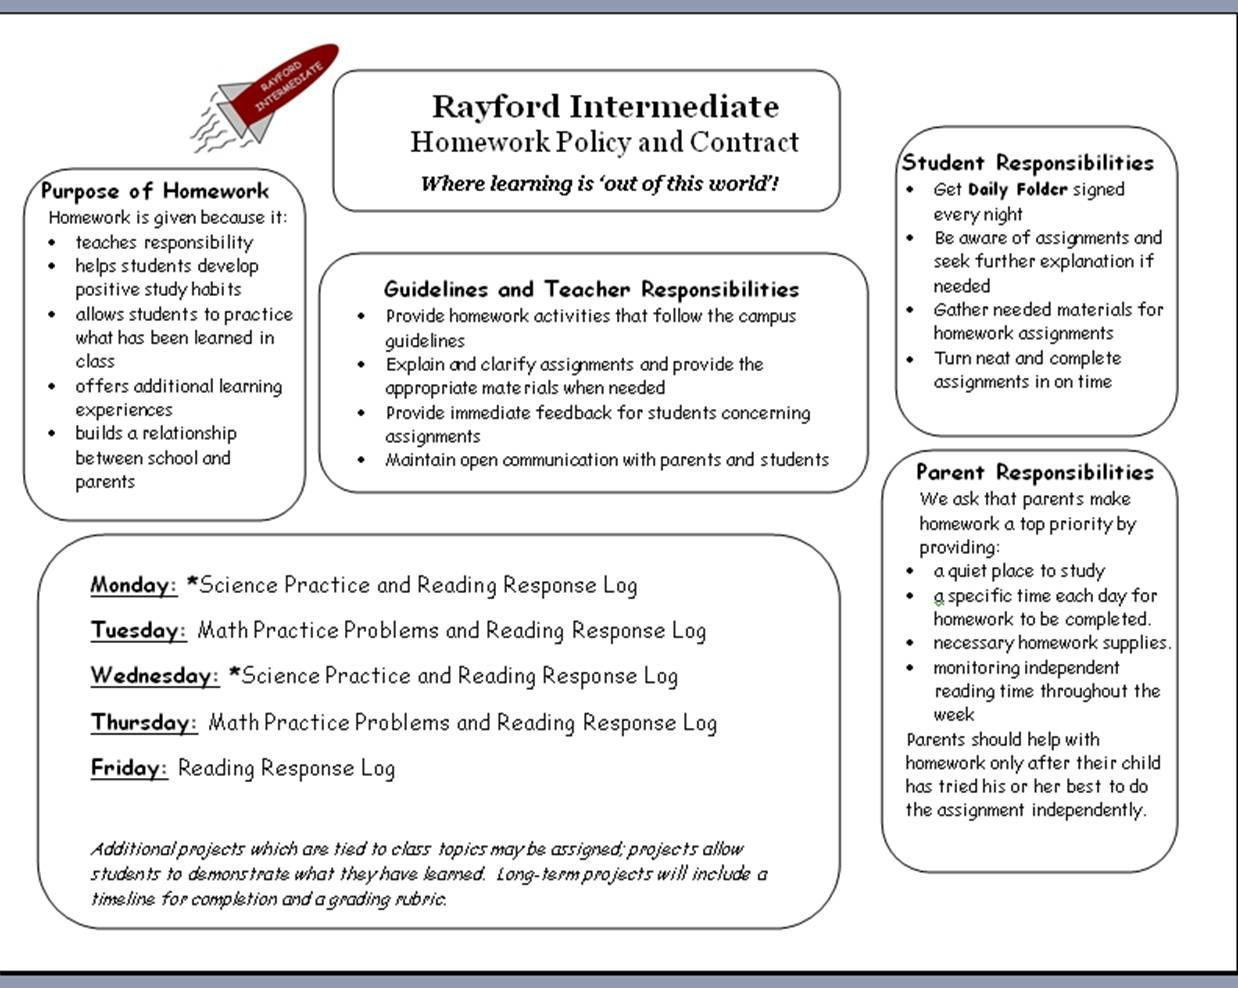 Importance of regularity in doing homework